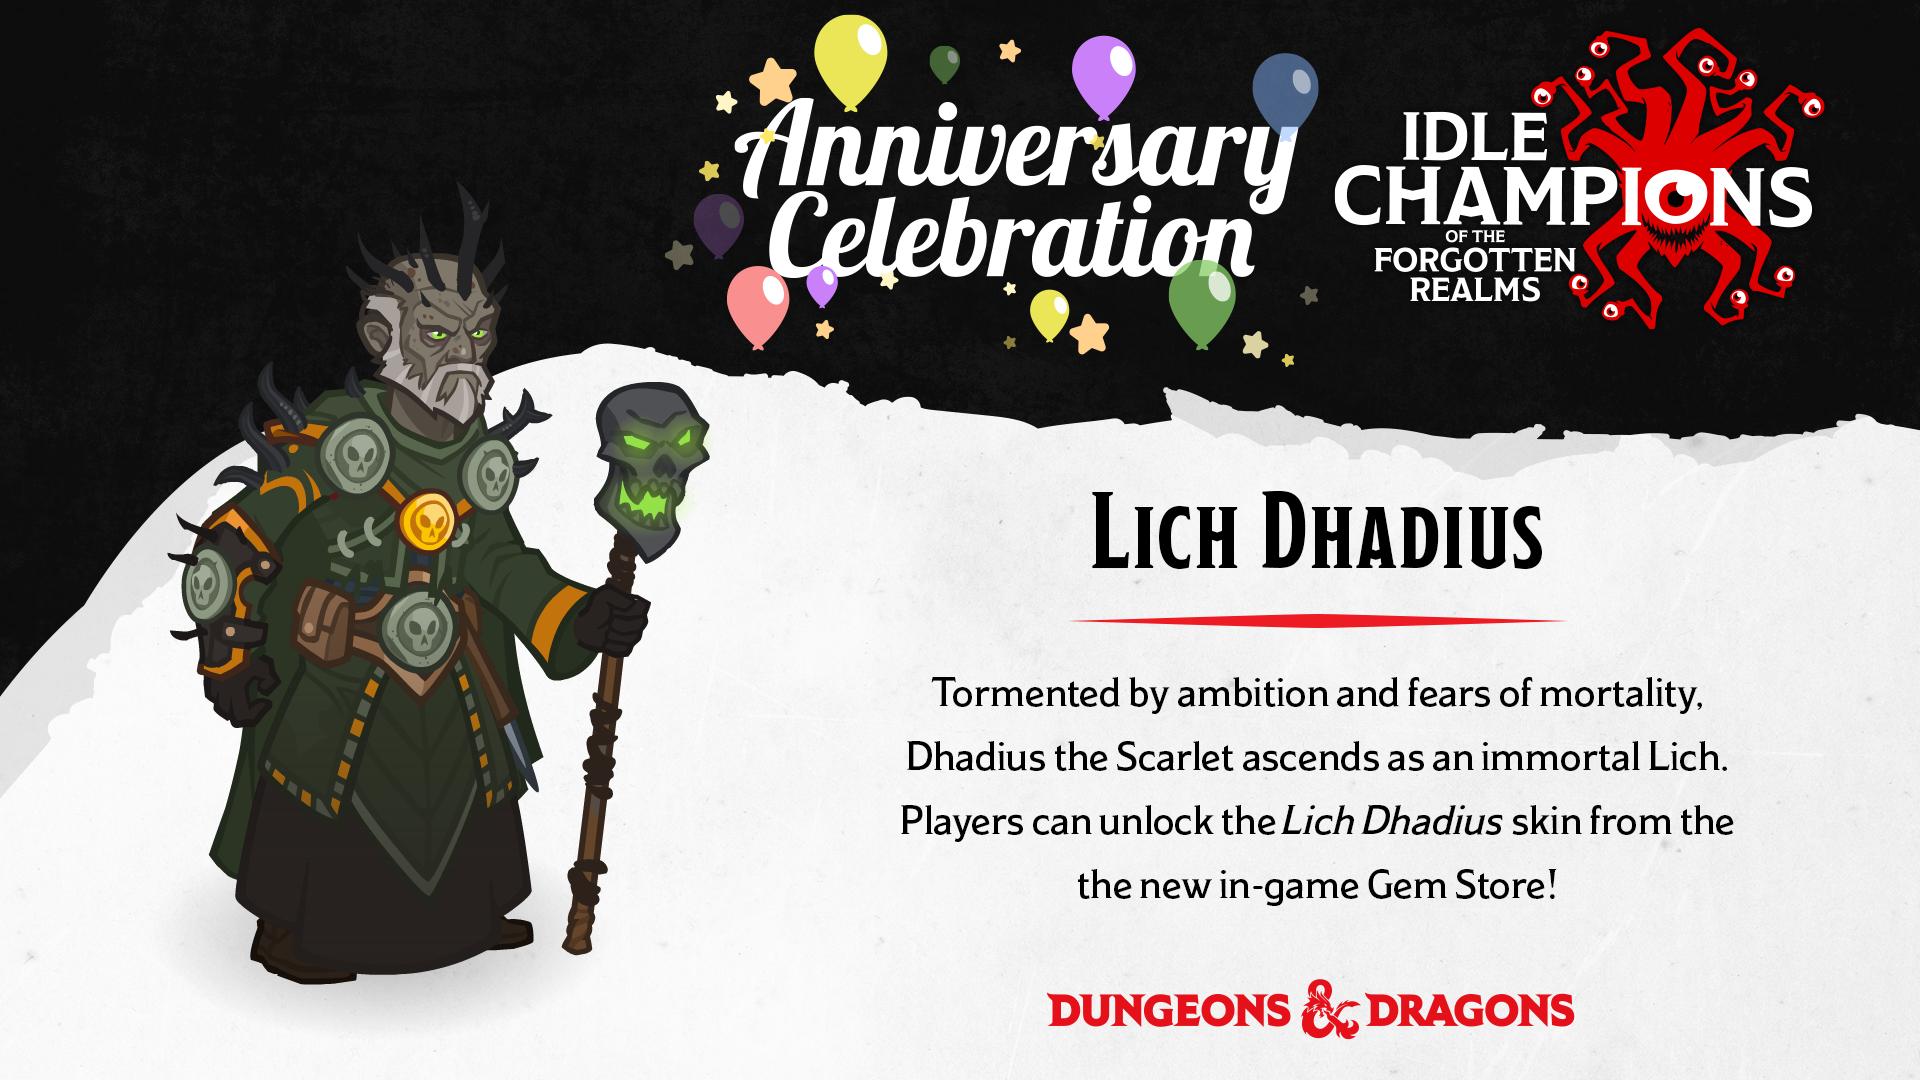 Dungeons & Dragons Lich Dhadius